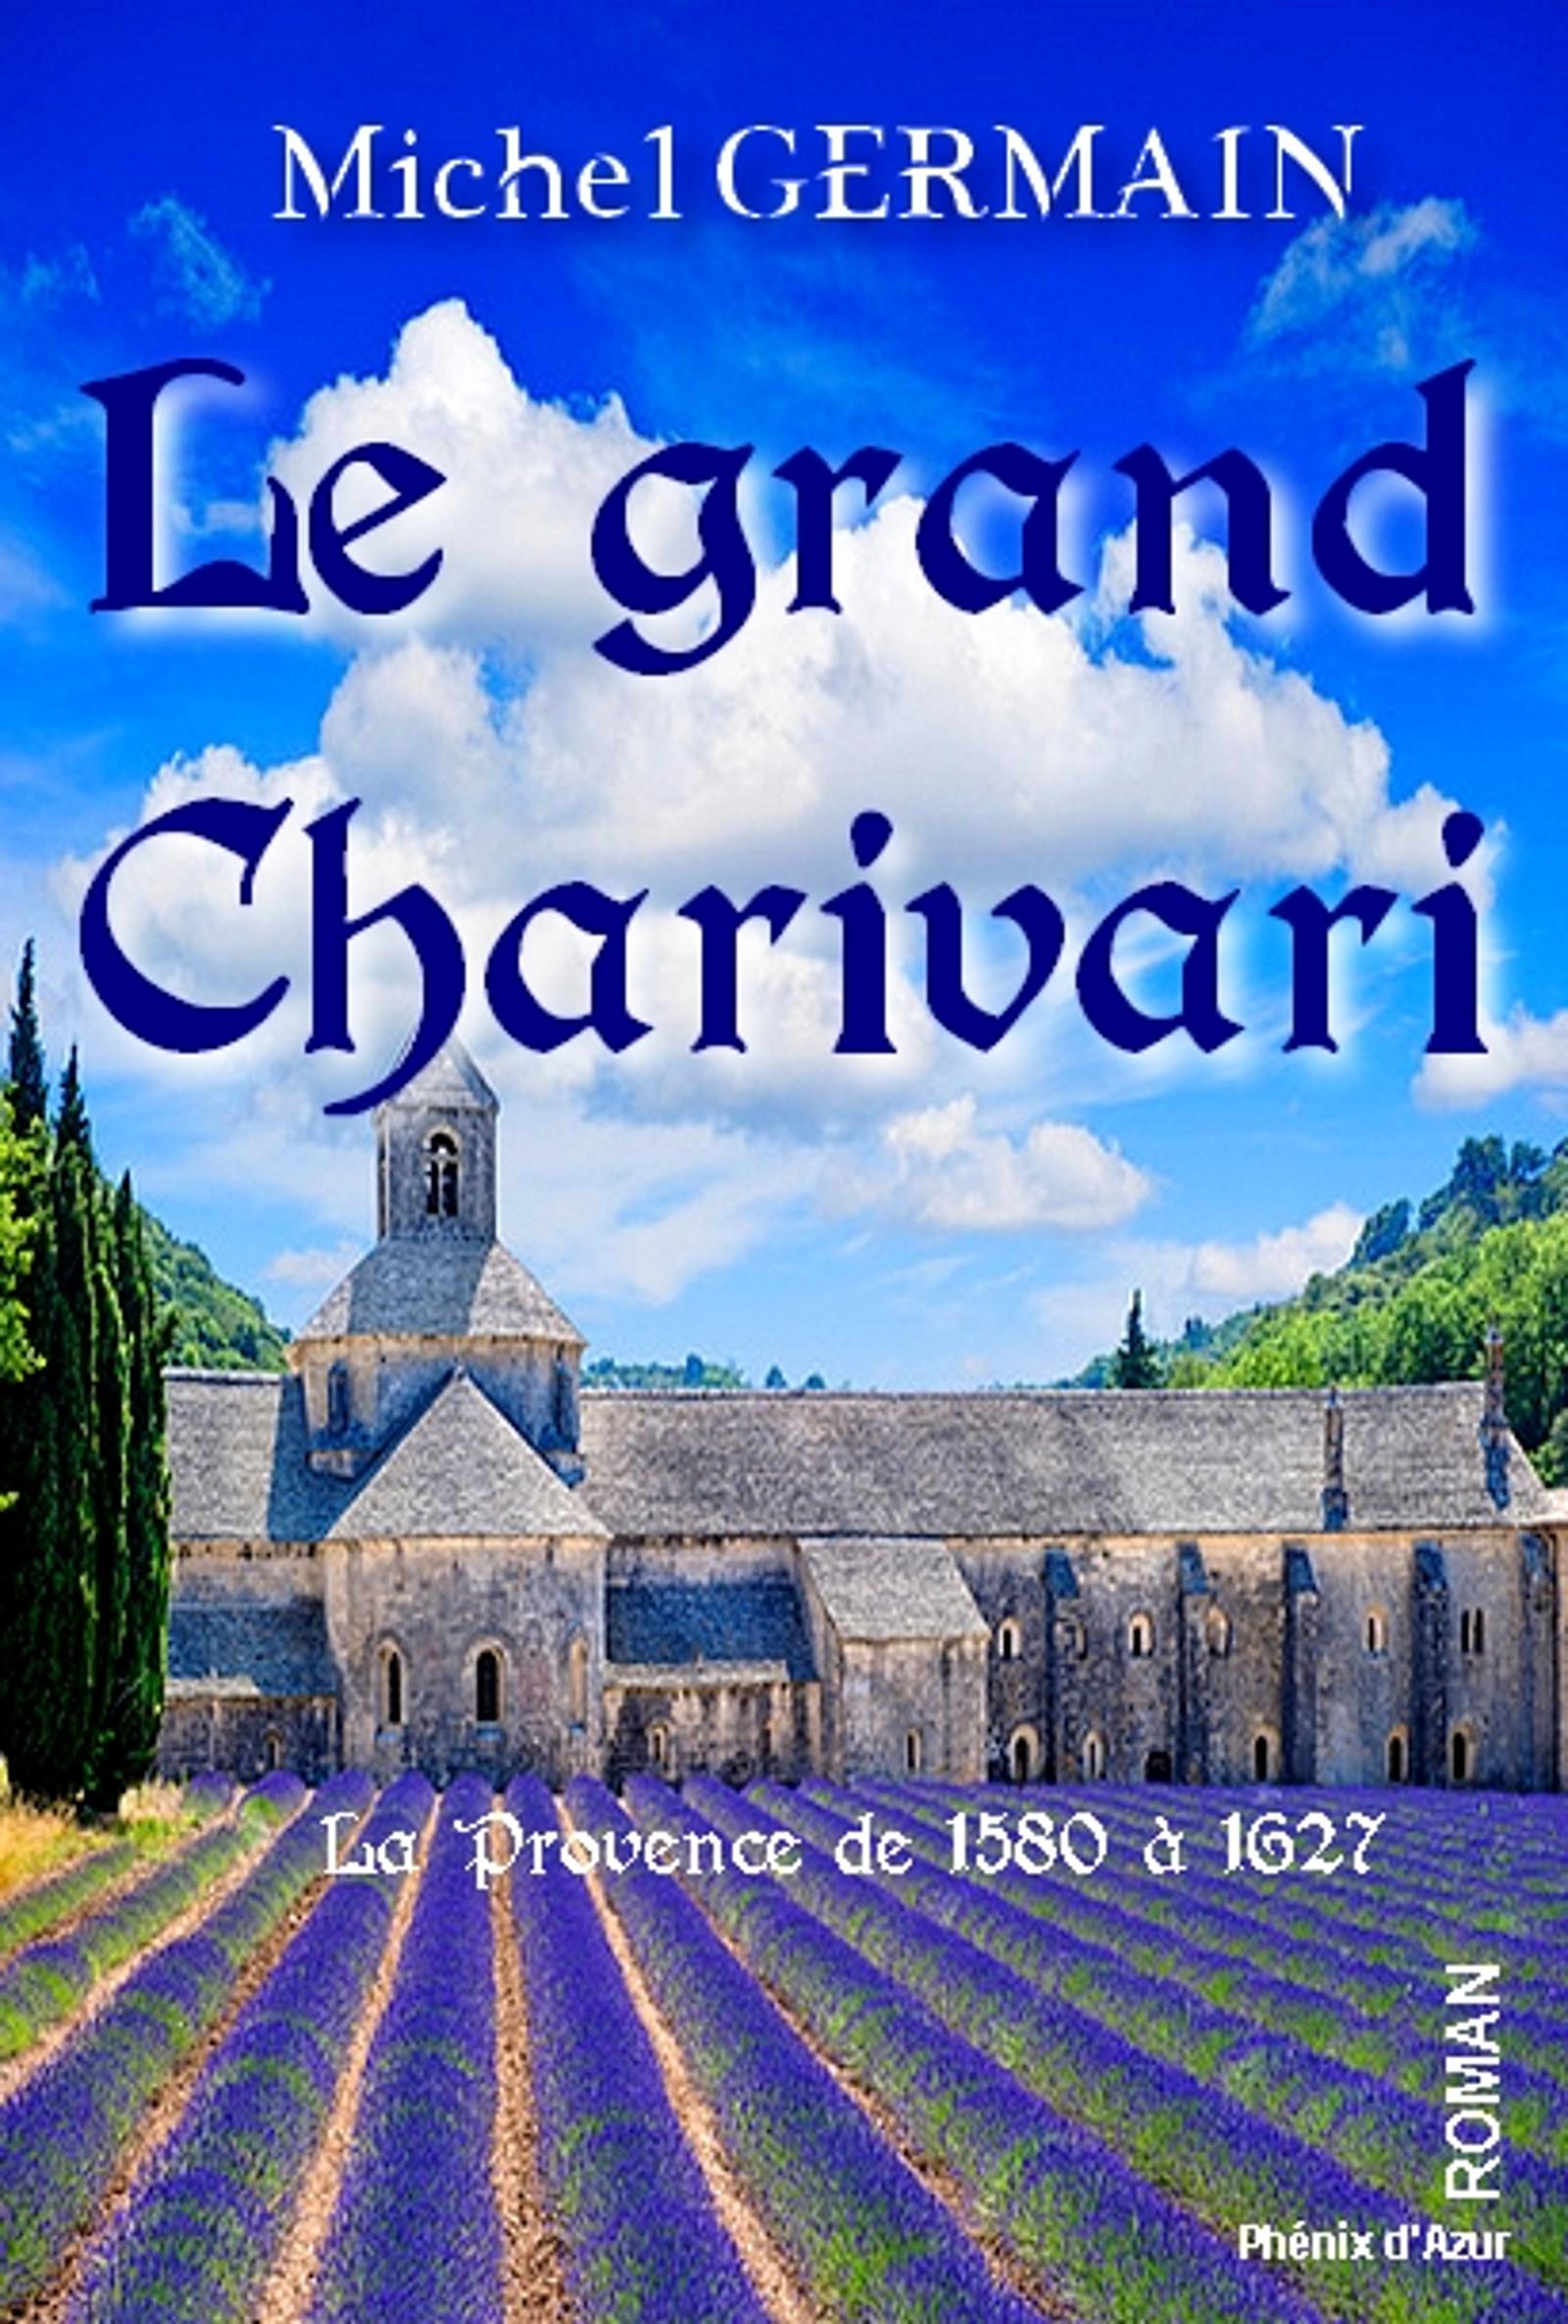 Le grand Charivari, La Provence de 1580 à 1627